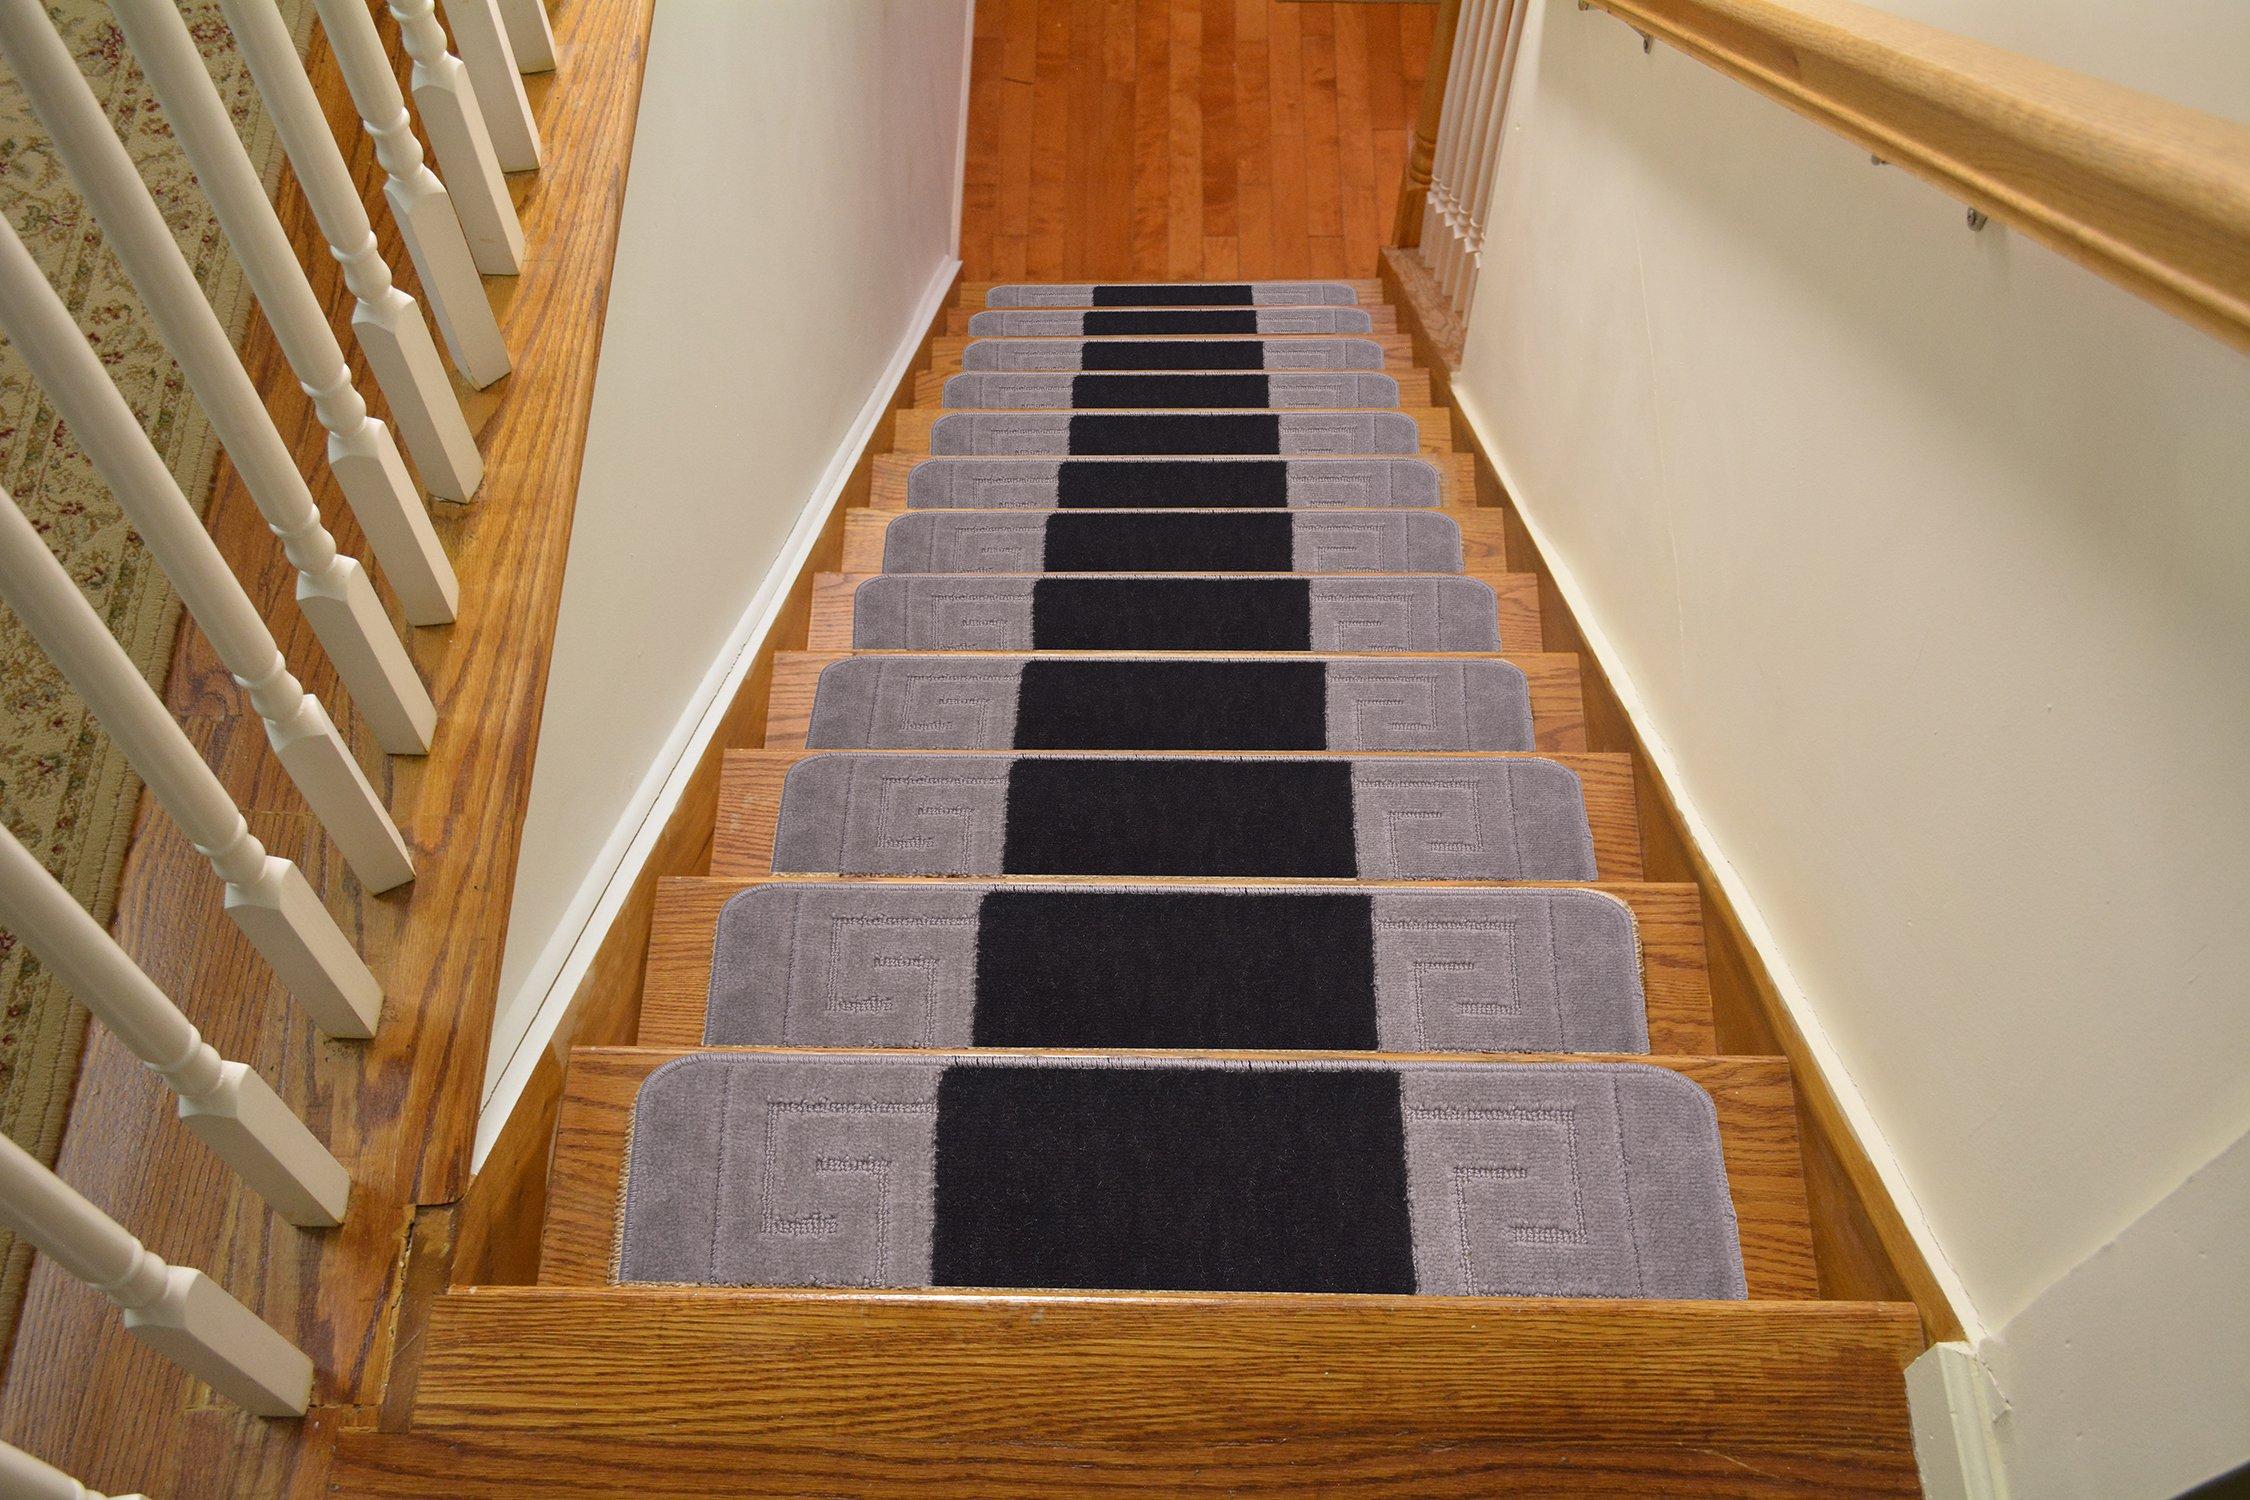 Millenium Stair Tread Treads Meander Greek Key Design Indoor Skid Slip Resistant Carpet Stair Tread Treads Machine Washable 8 ½ inch x 30 inch (Set of 13, Meander Black-Grey)